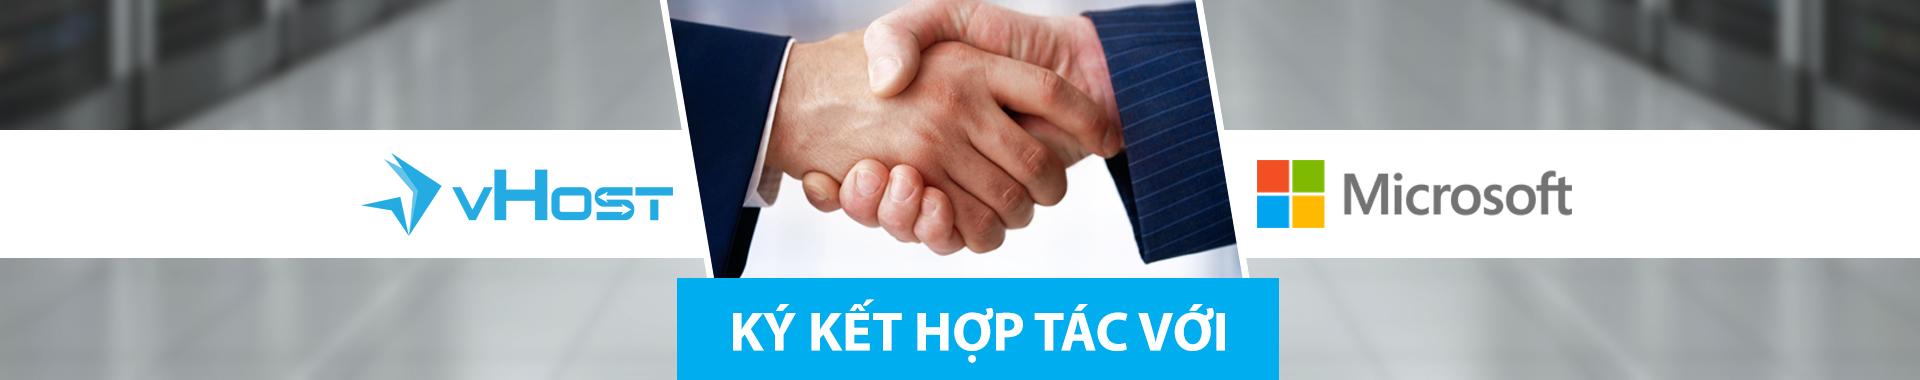 ky-hop-tac-voi-microsoft-home